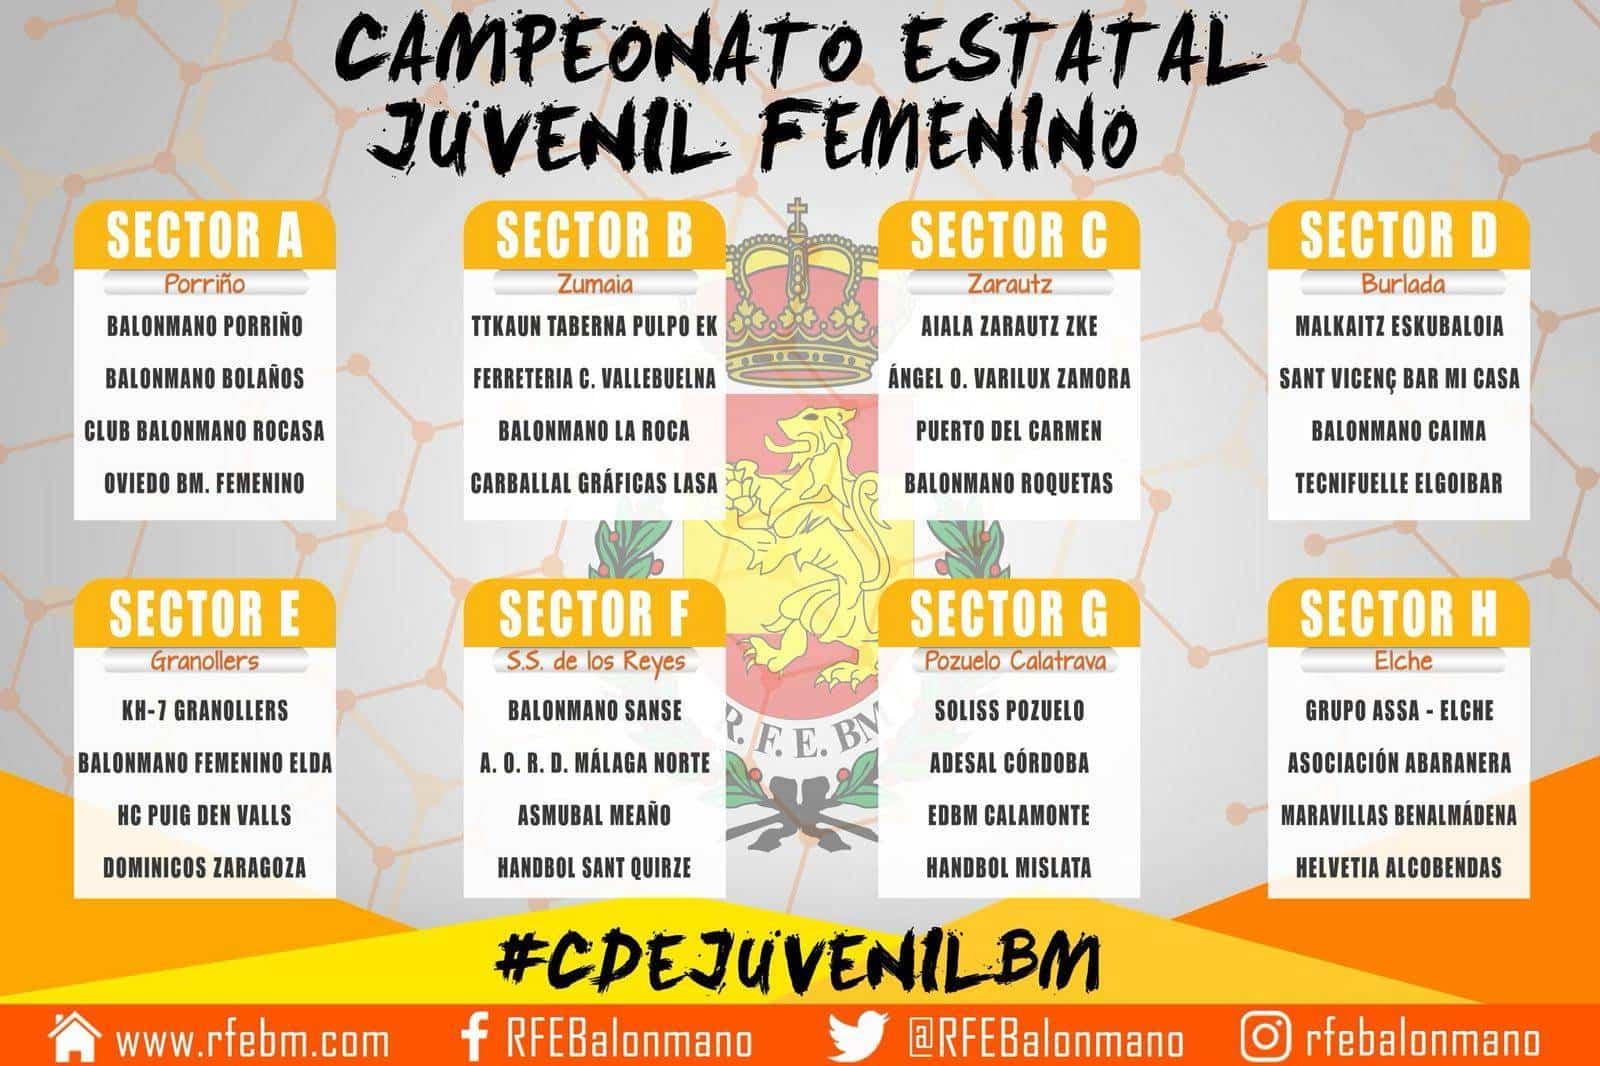 campeonato estatal juvenil femenino balonmano - Herencianas en el Campeonato Estatal Juvenil Femenino de Balonmano